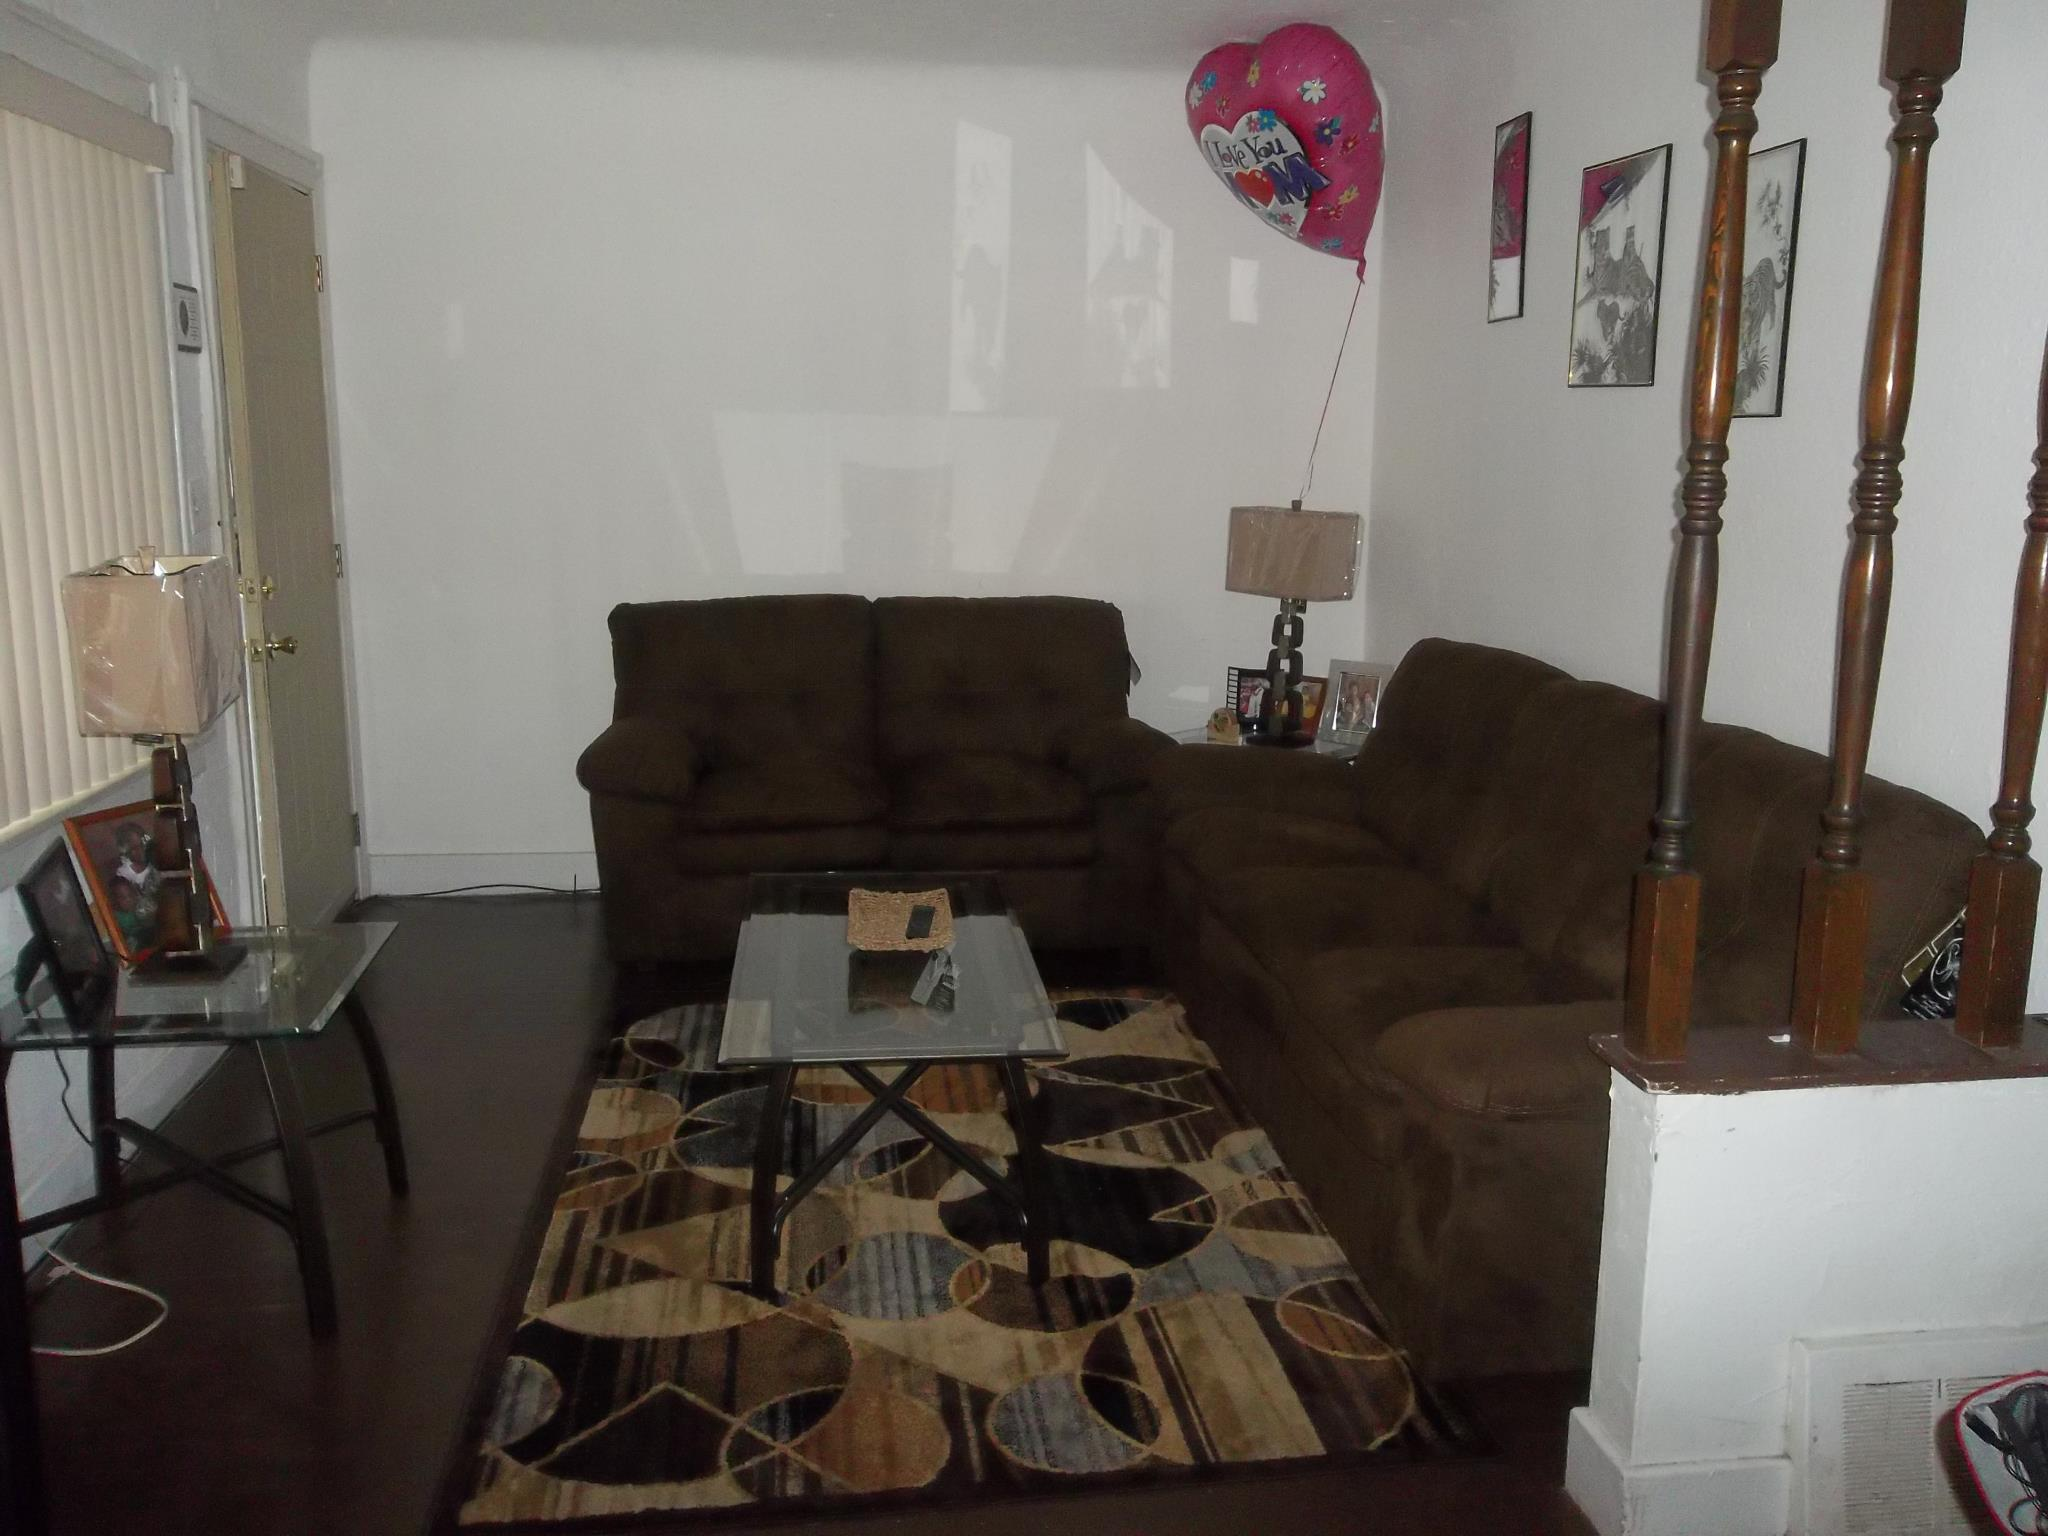 Bedroom At Gardner White Furniture